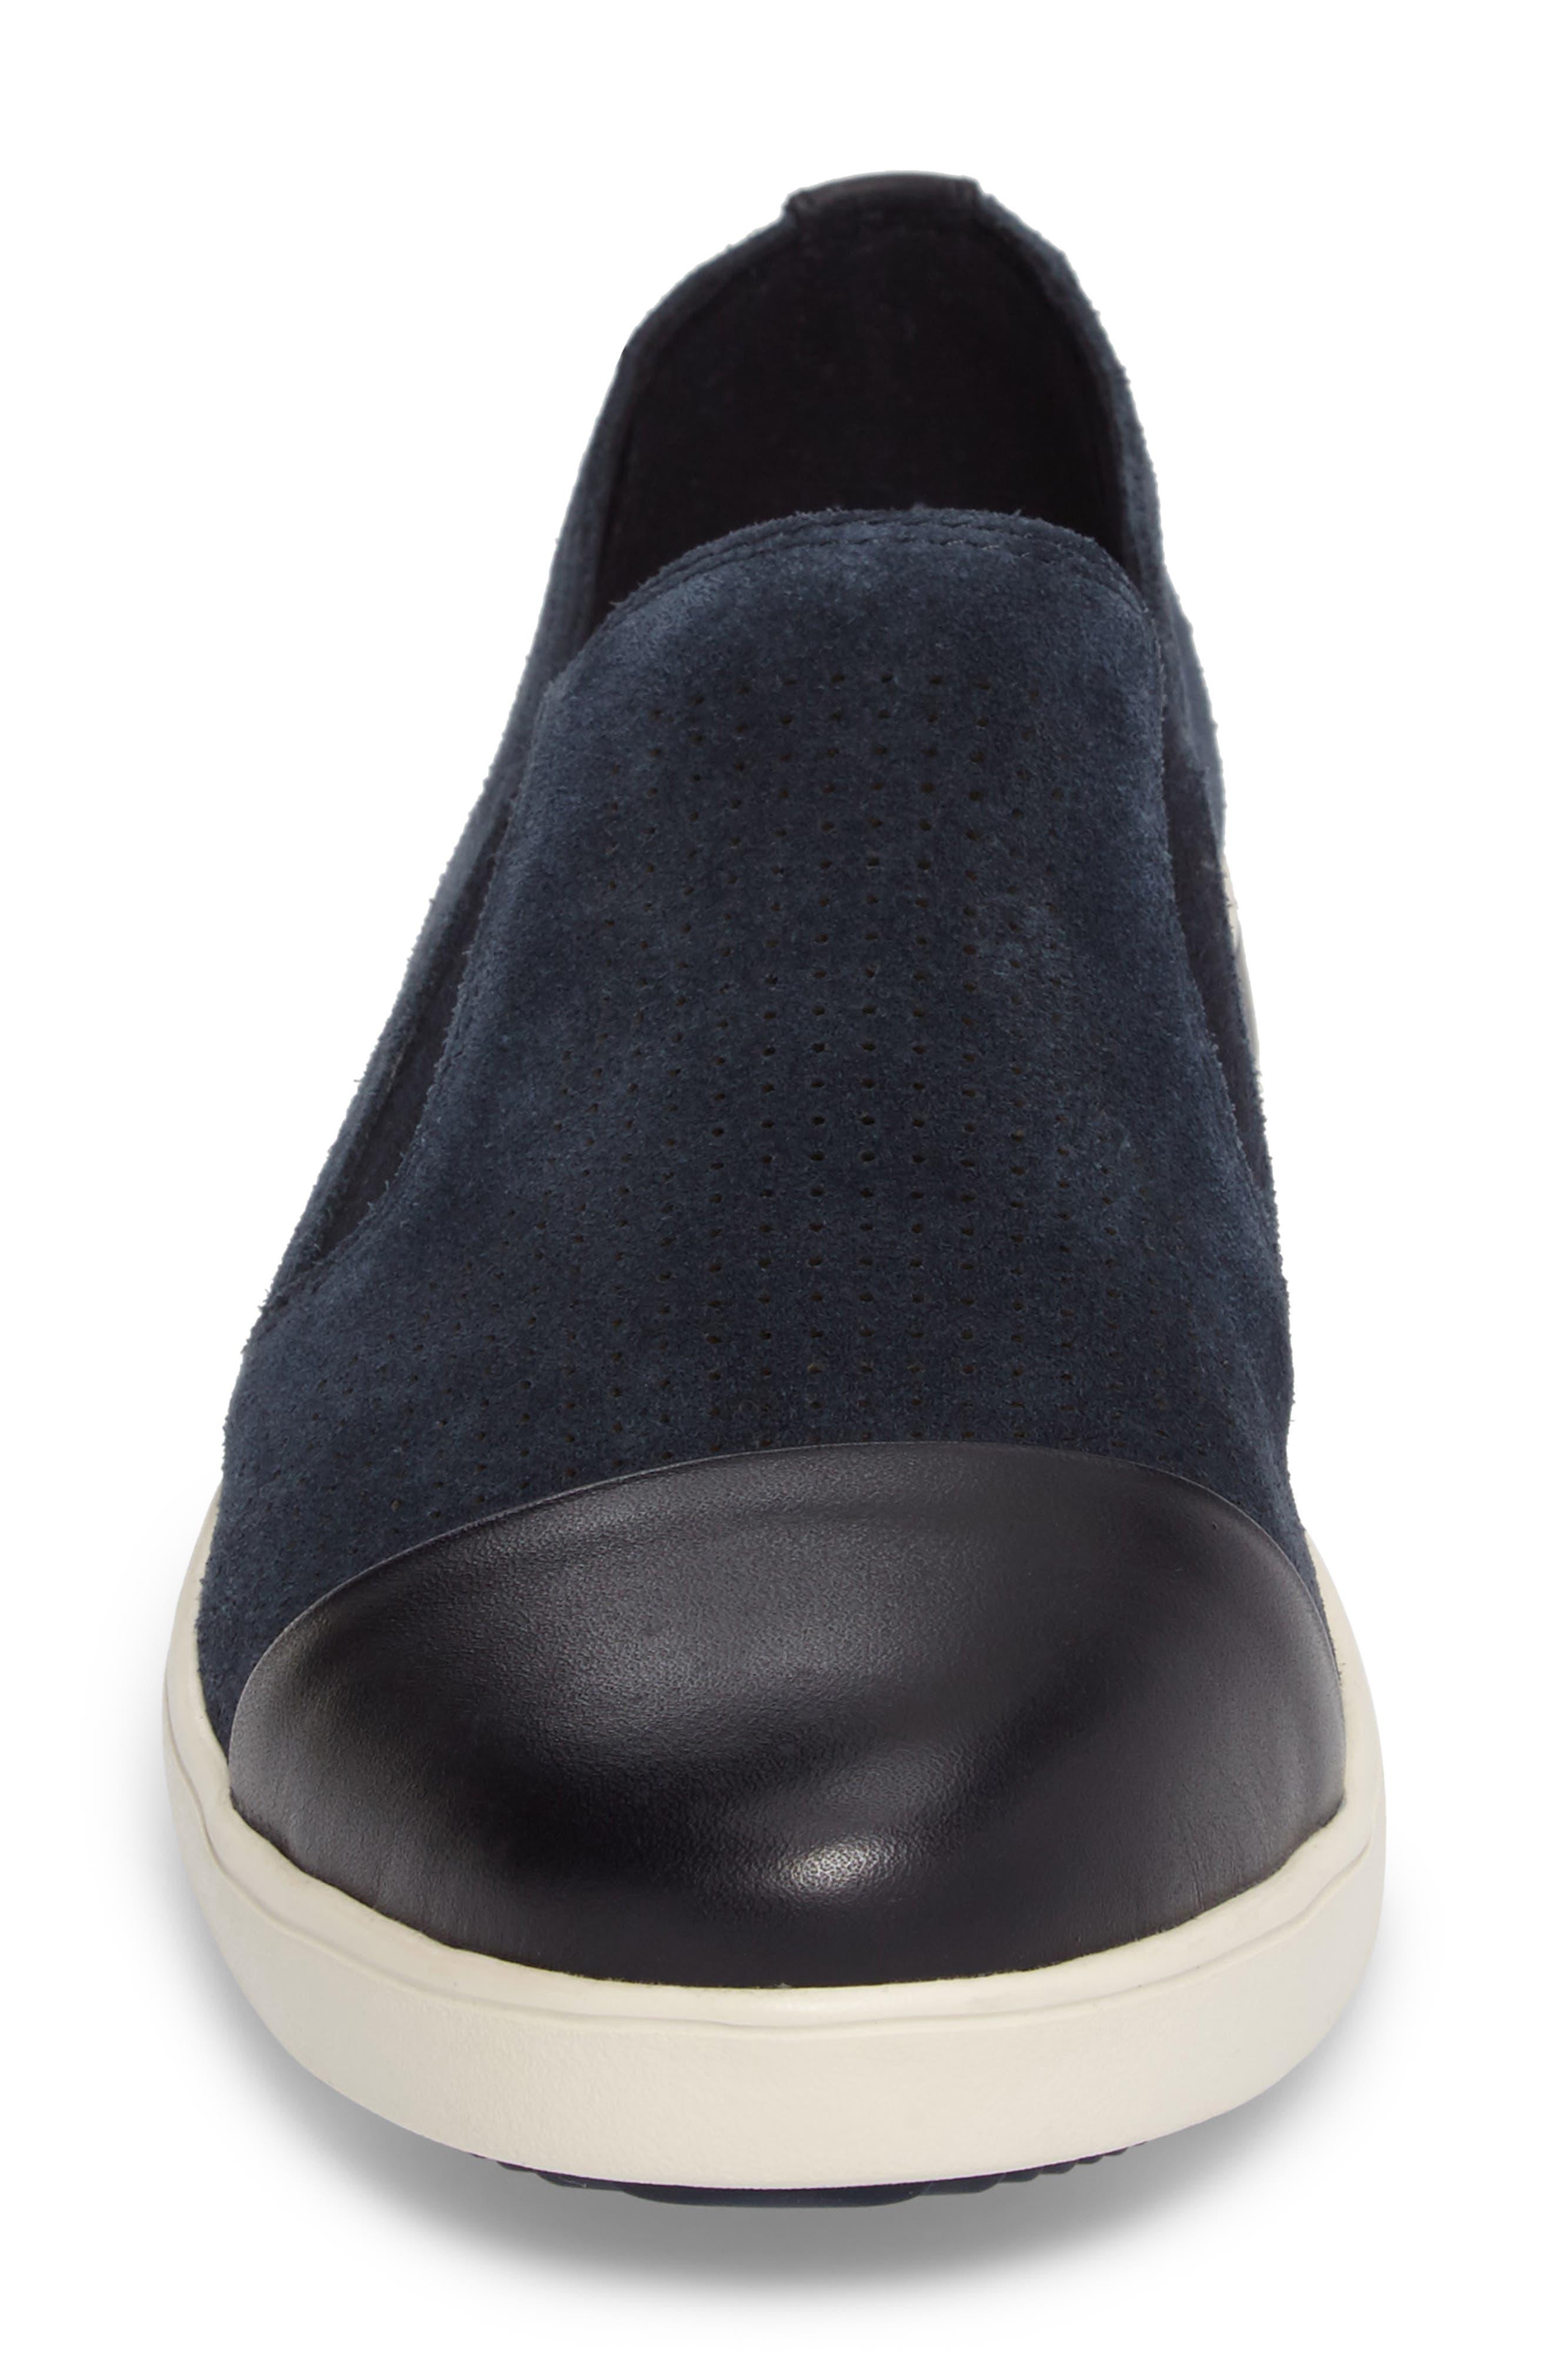 Aviana Cap Toe Slip-On Sneaker,                             Alternate thumbnail 4, color,                             Lagoon Suede